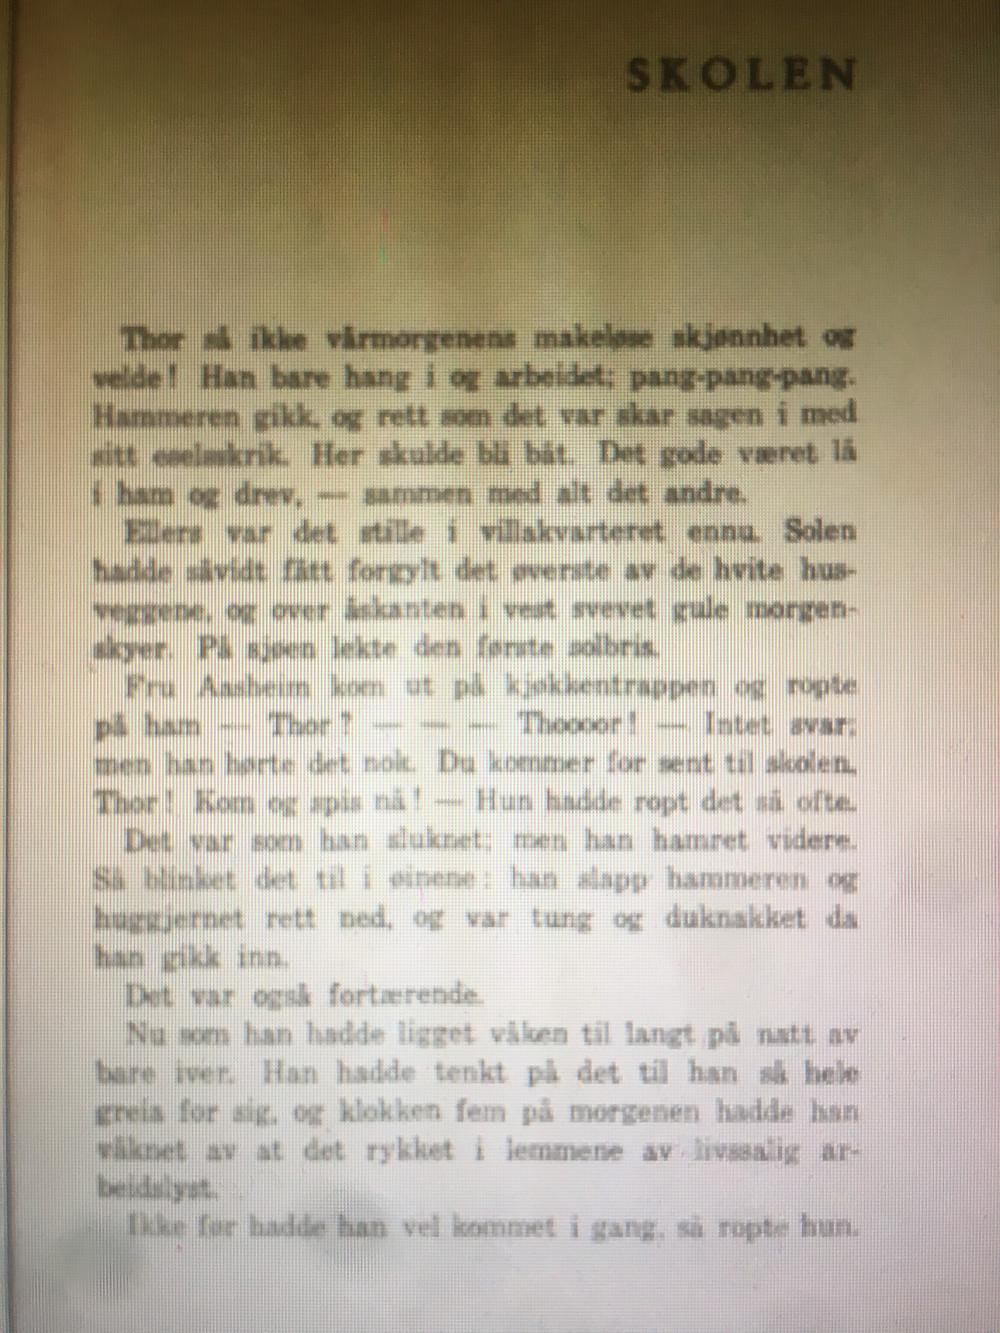 Gutten Tiden og Djevelen, Gunnar Havstad